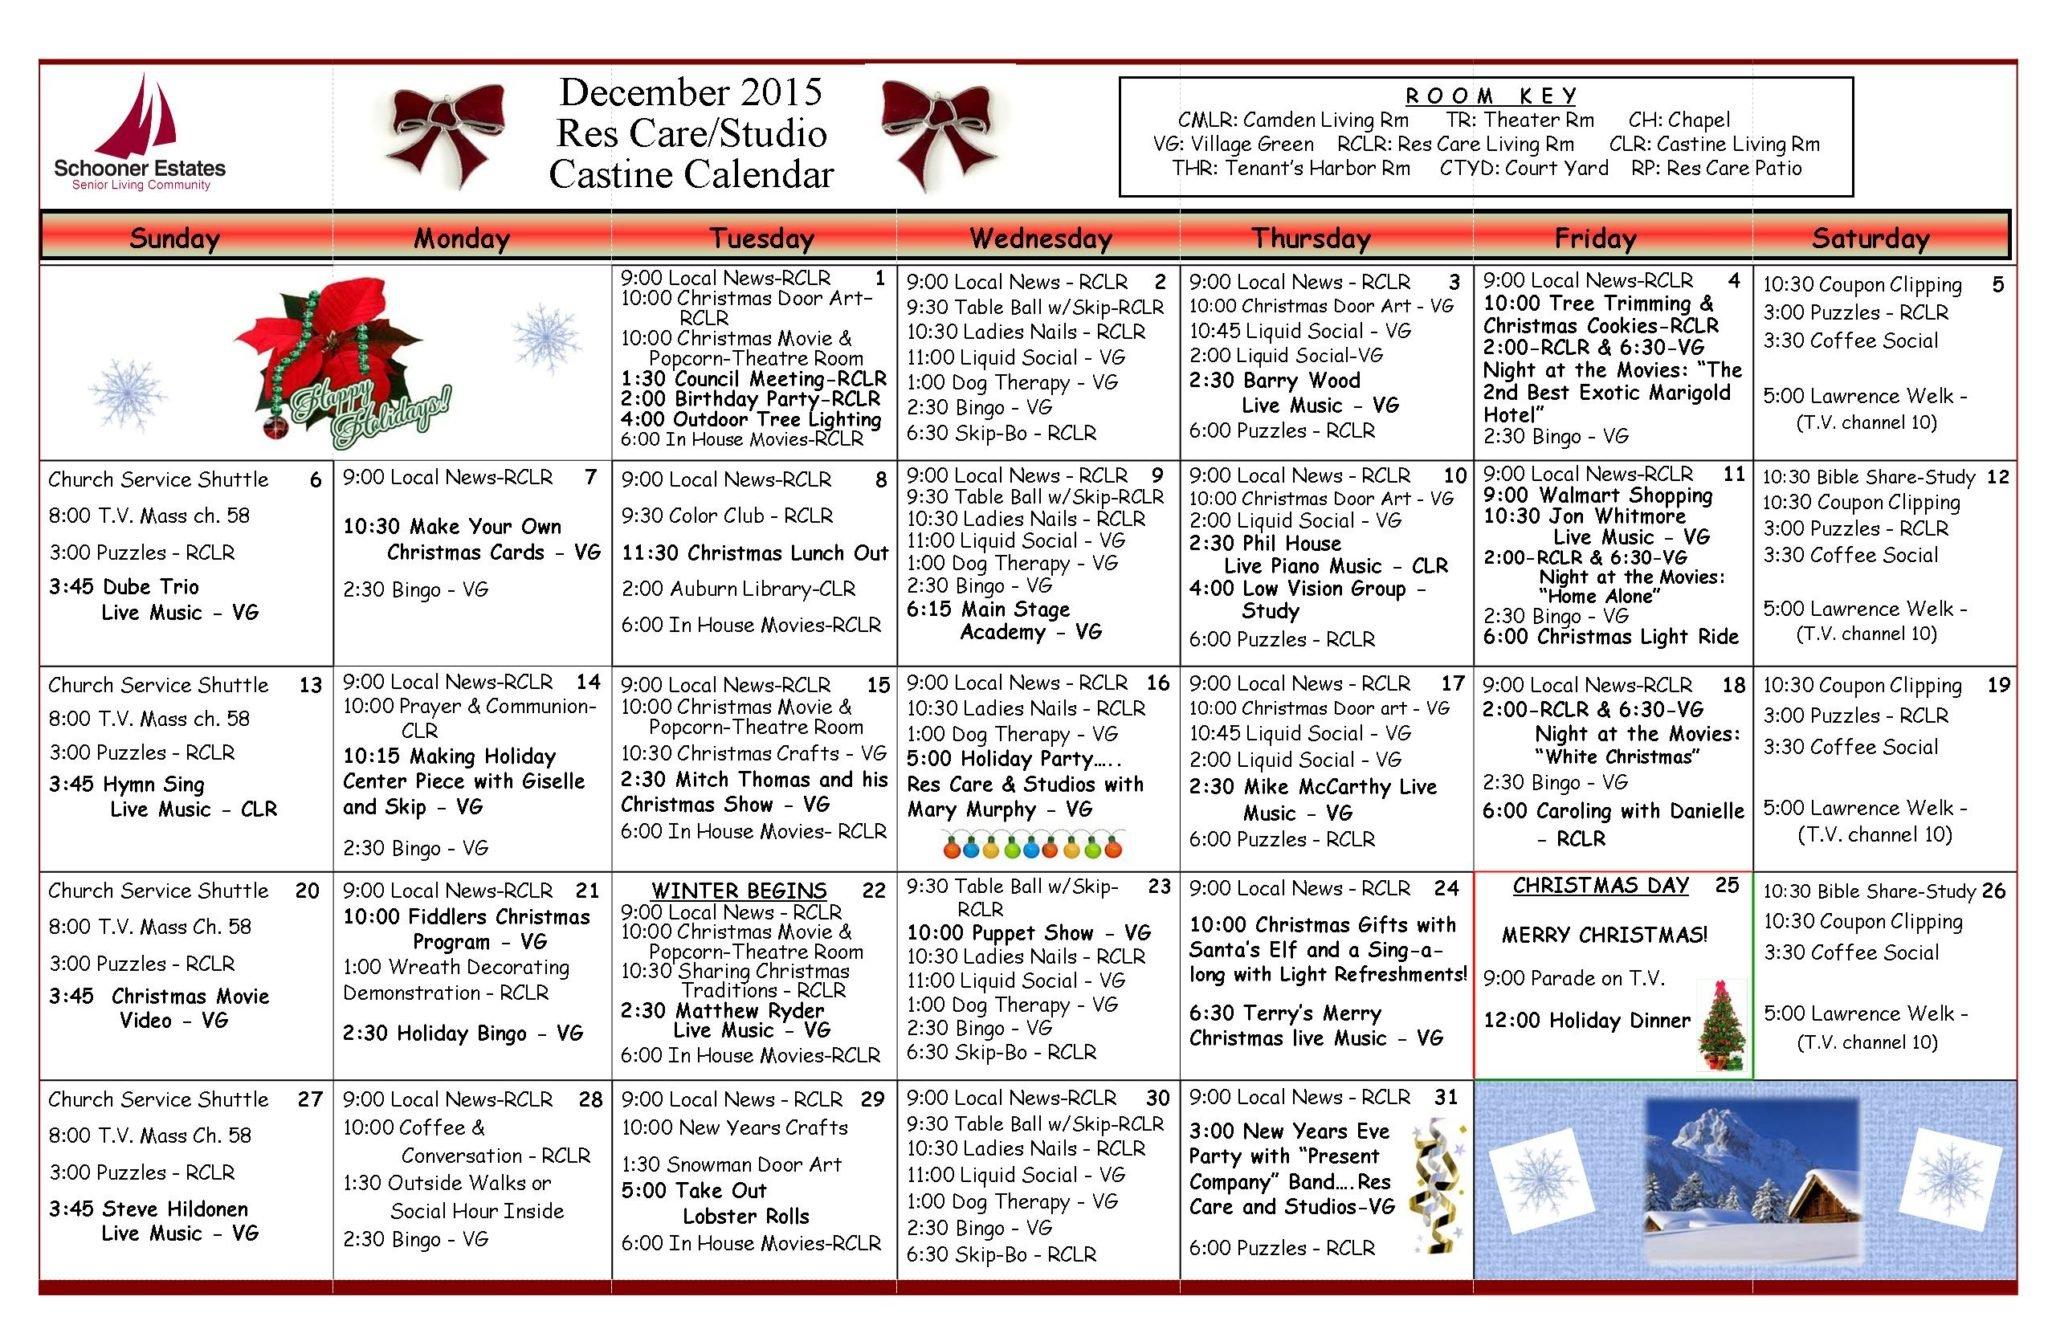 assisted living activity calendar template - december 2015 activity calendars